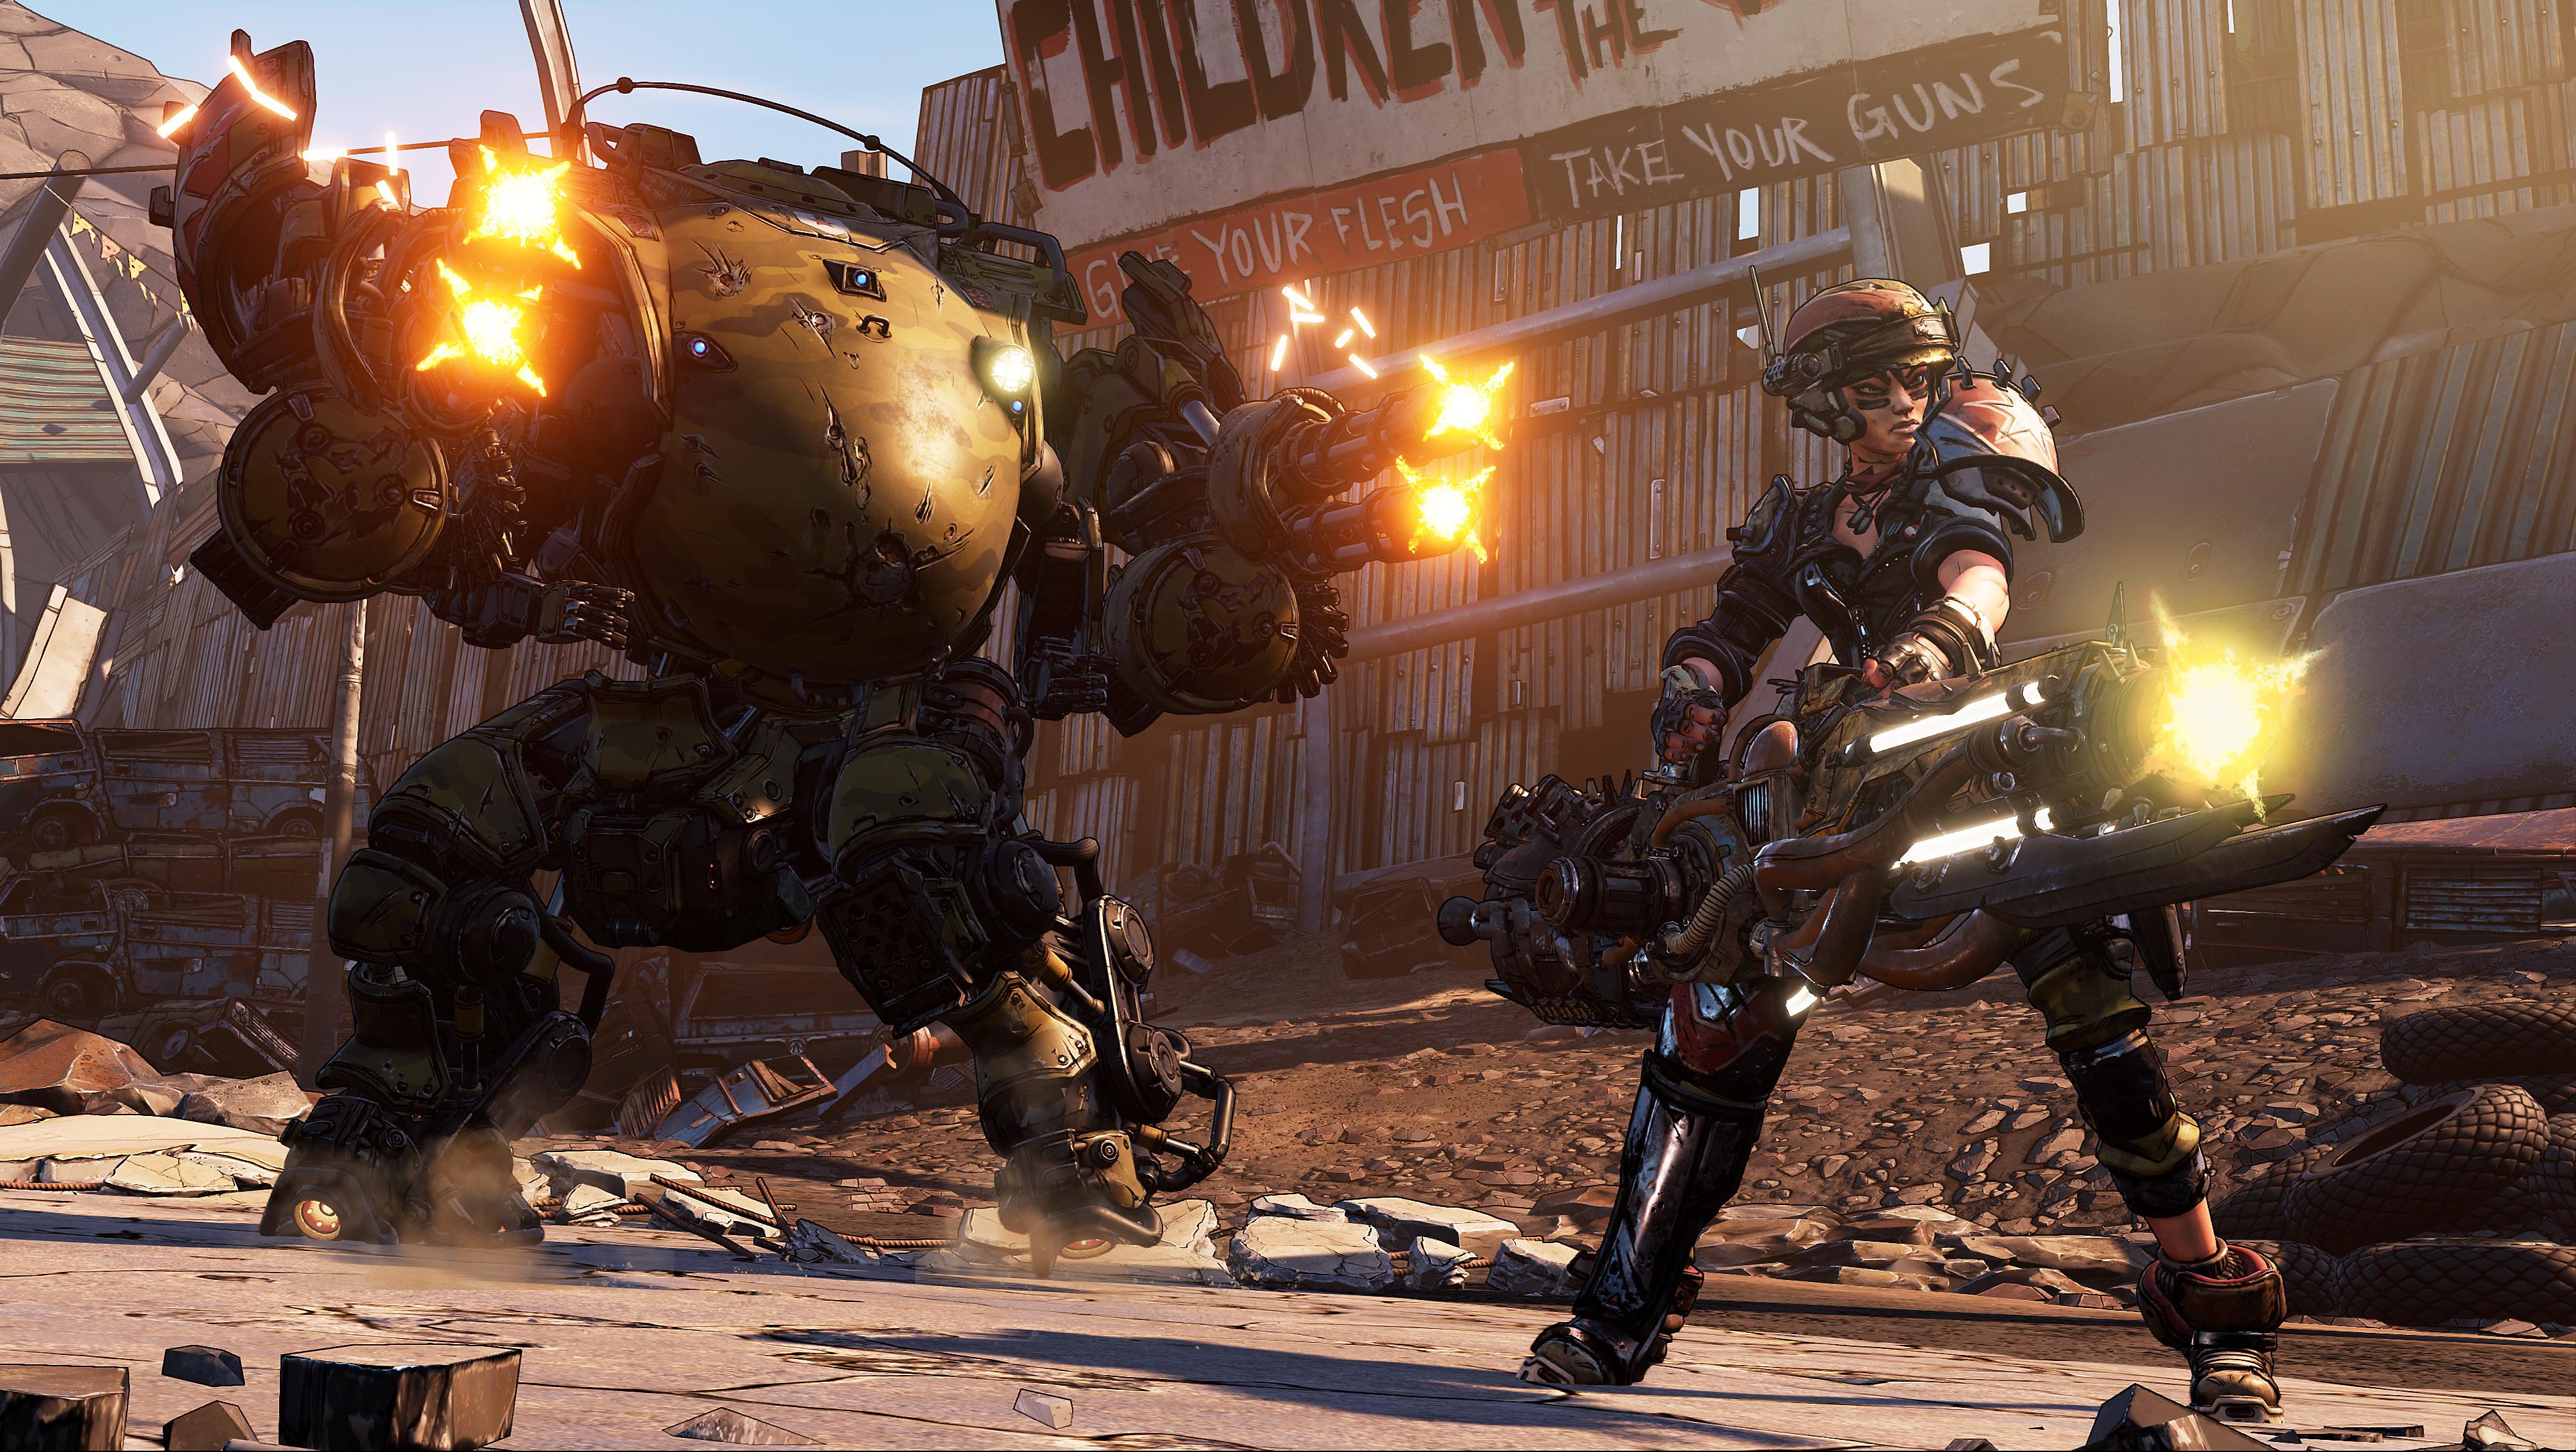 Borderlands 3 - Game Overview Screenshot 2